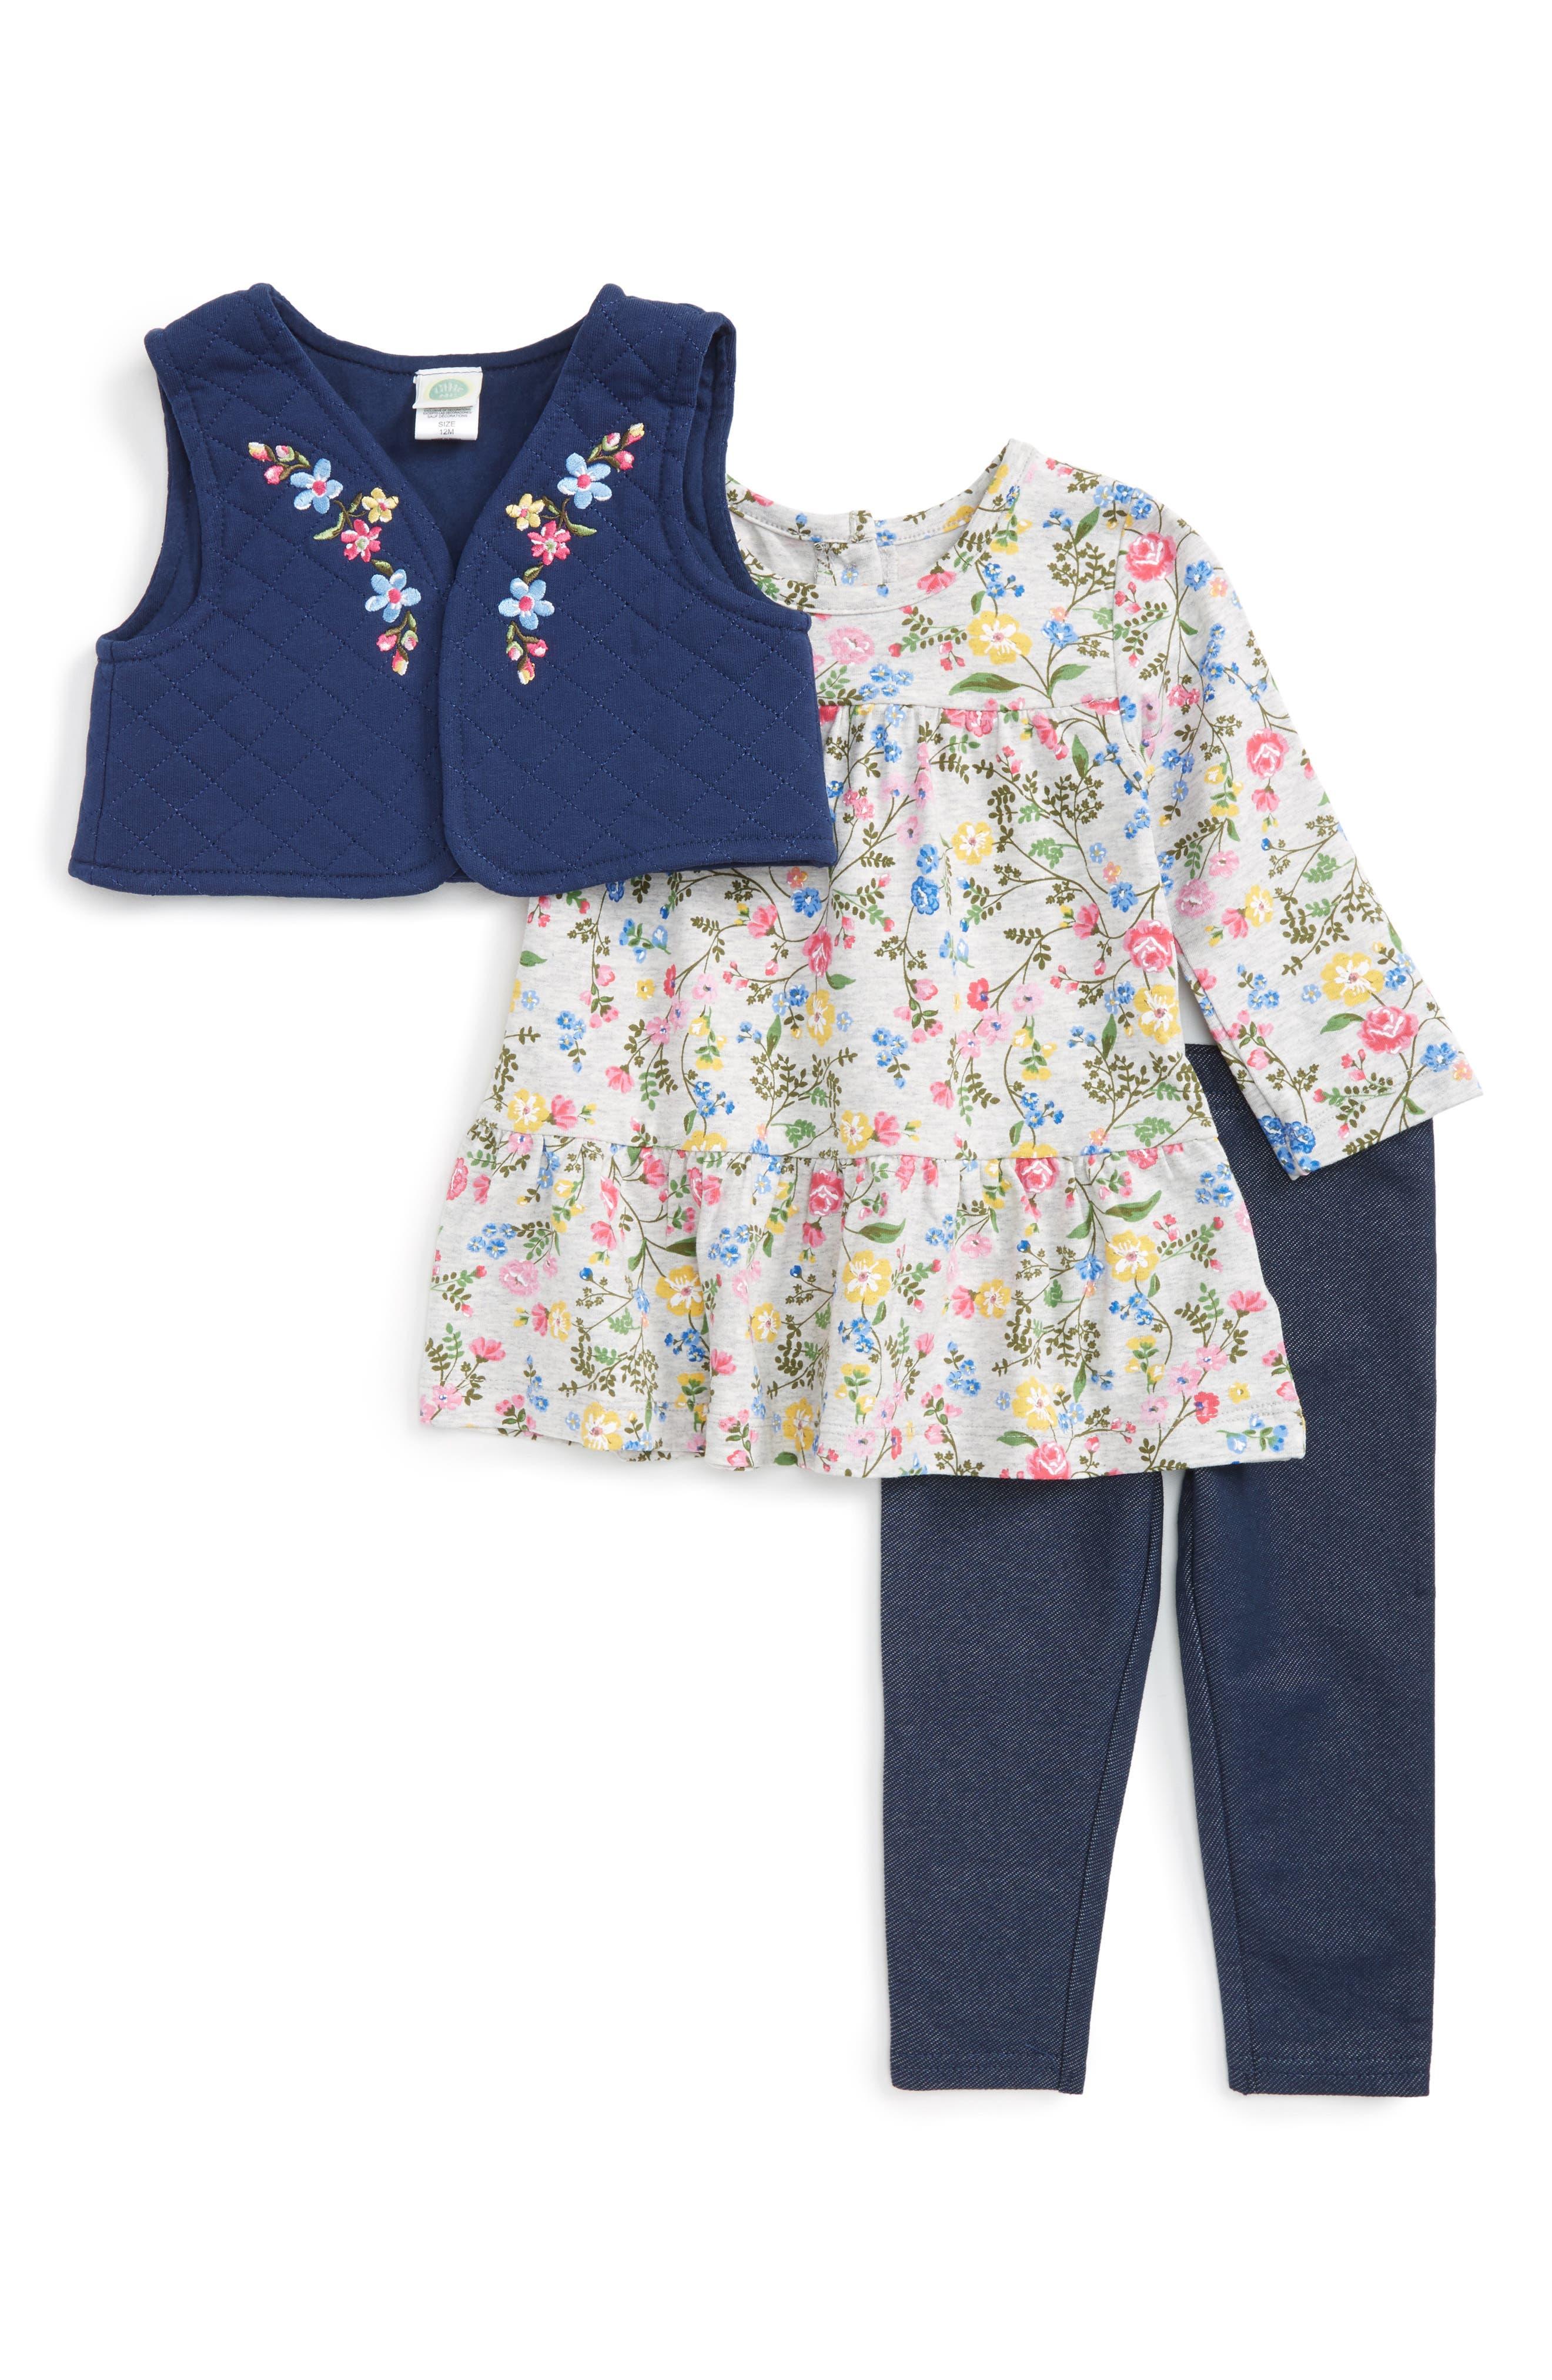 Main Image - Little Me Floral Vest, Shirt & Pants Set (Baby Girls)